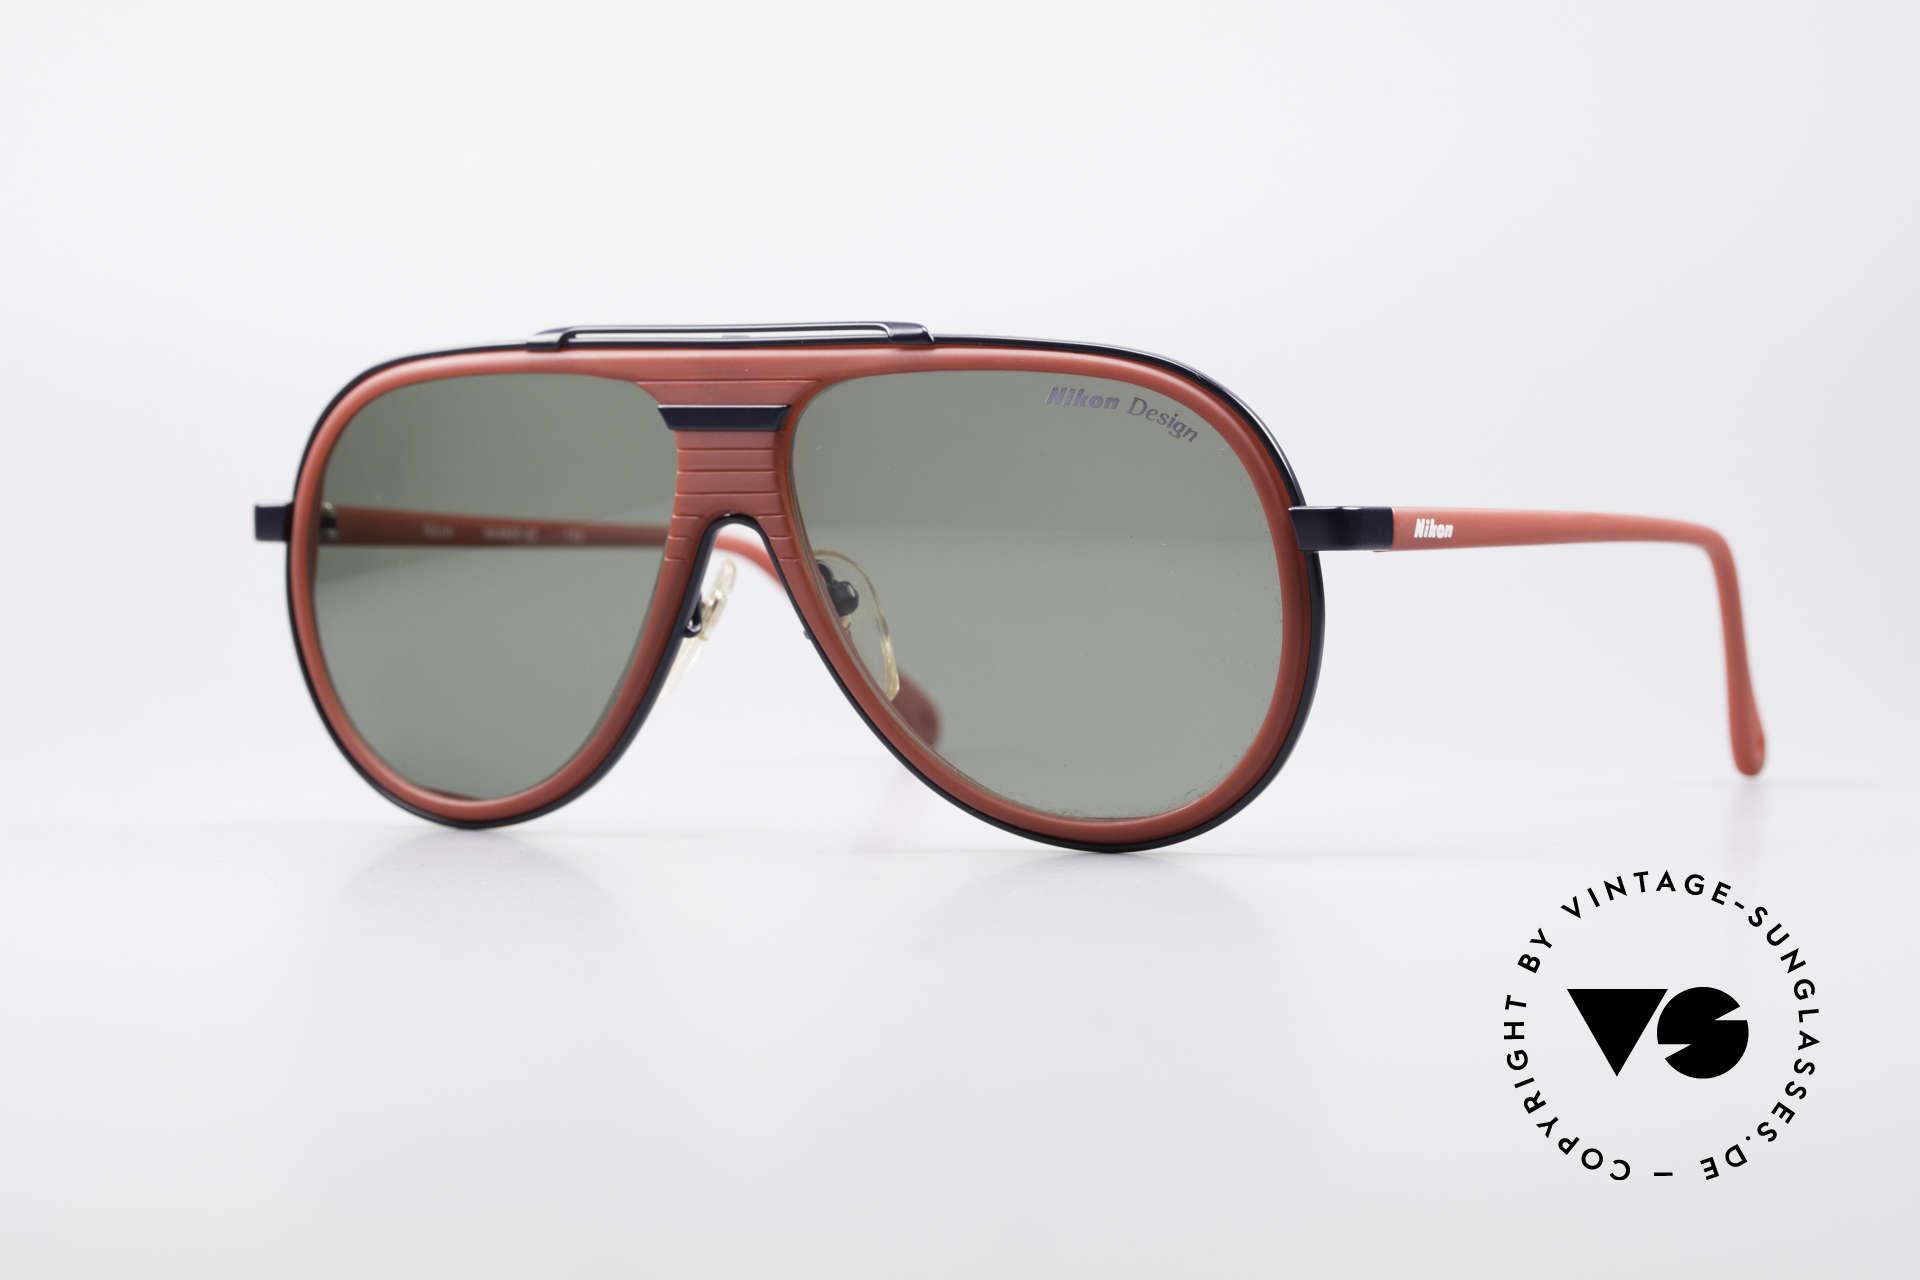 Nikon NK4800 Rare 80's Premium Shades, 80's vintage designer sunglasses by Nikon (Japan), Made for Men